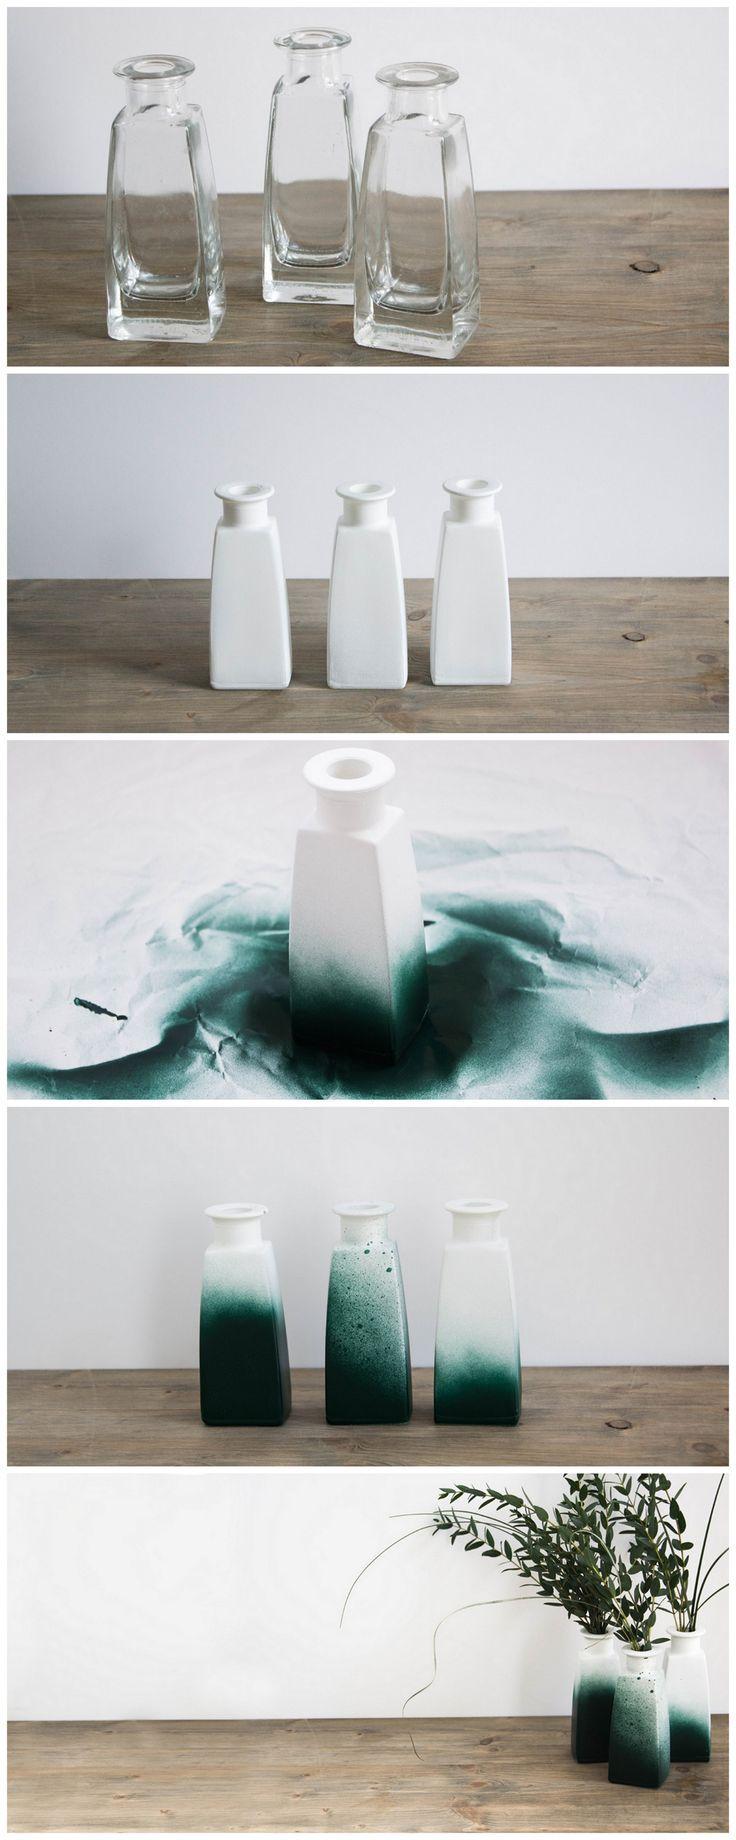 diy idee vasen upcycling mit gr ner spr hfarbe do it yourself idea flower diy deko. Black Bedroom Furniture Sets. Home Design Ideas